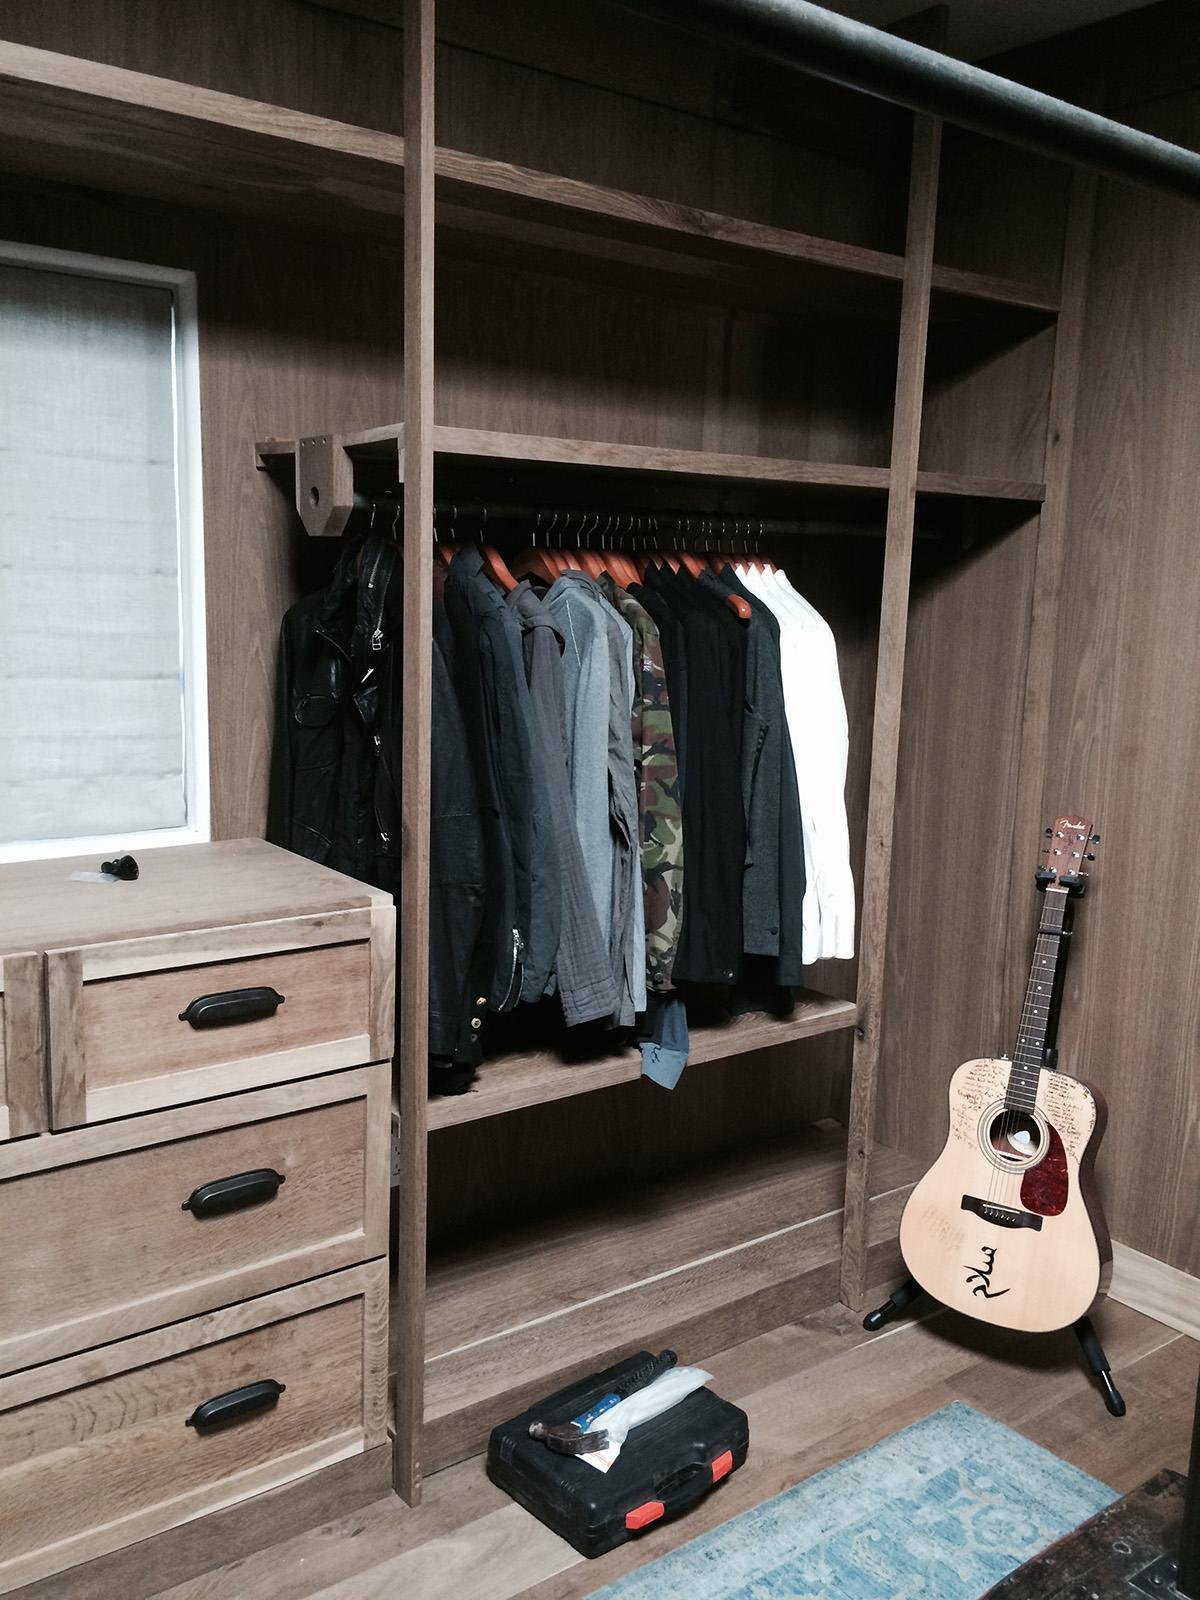 chris closet.jpg